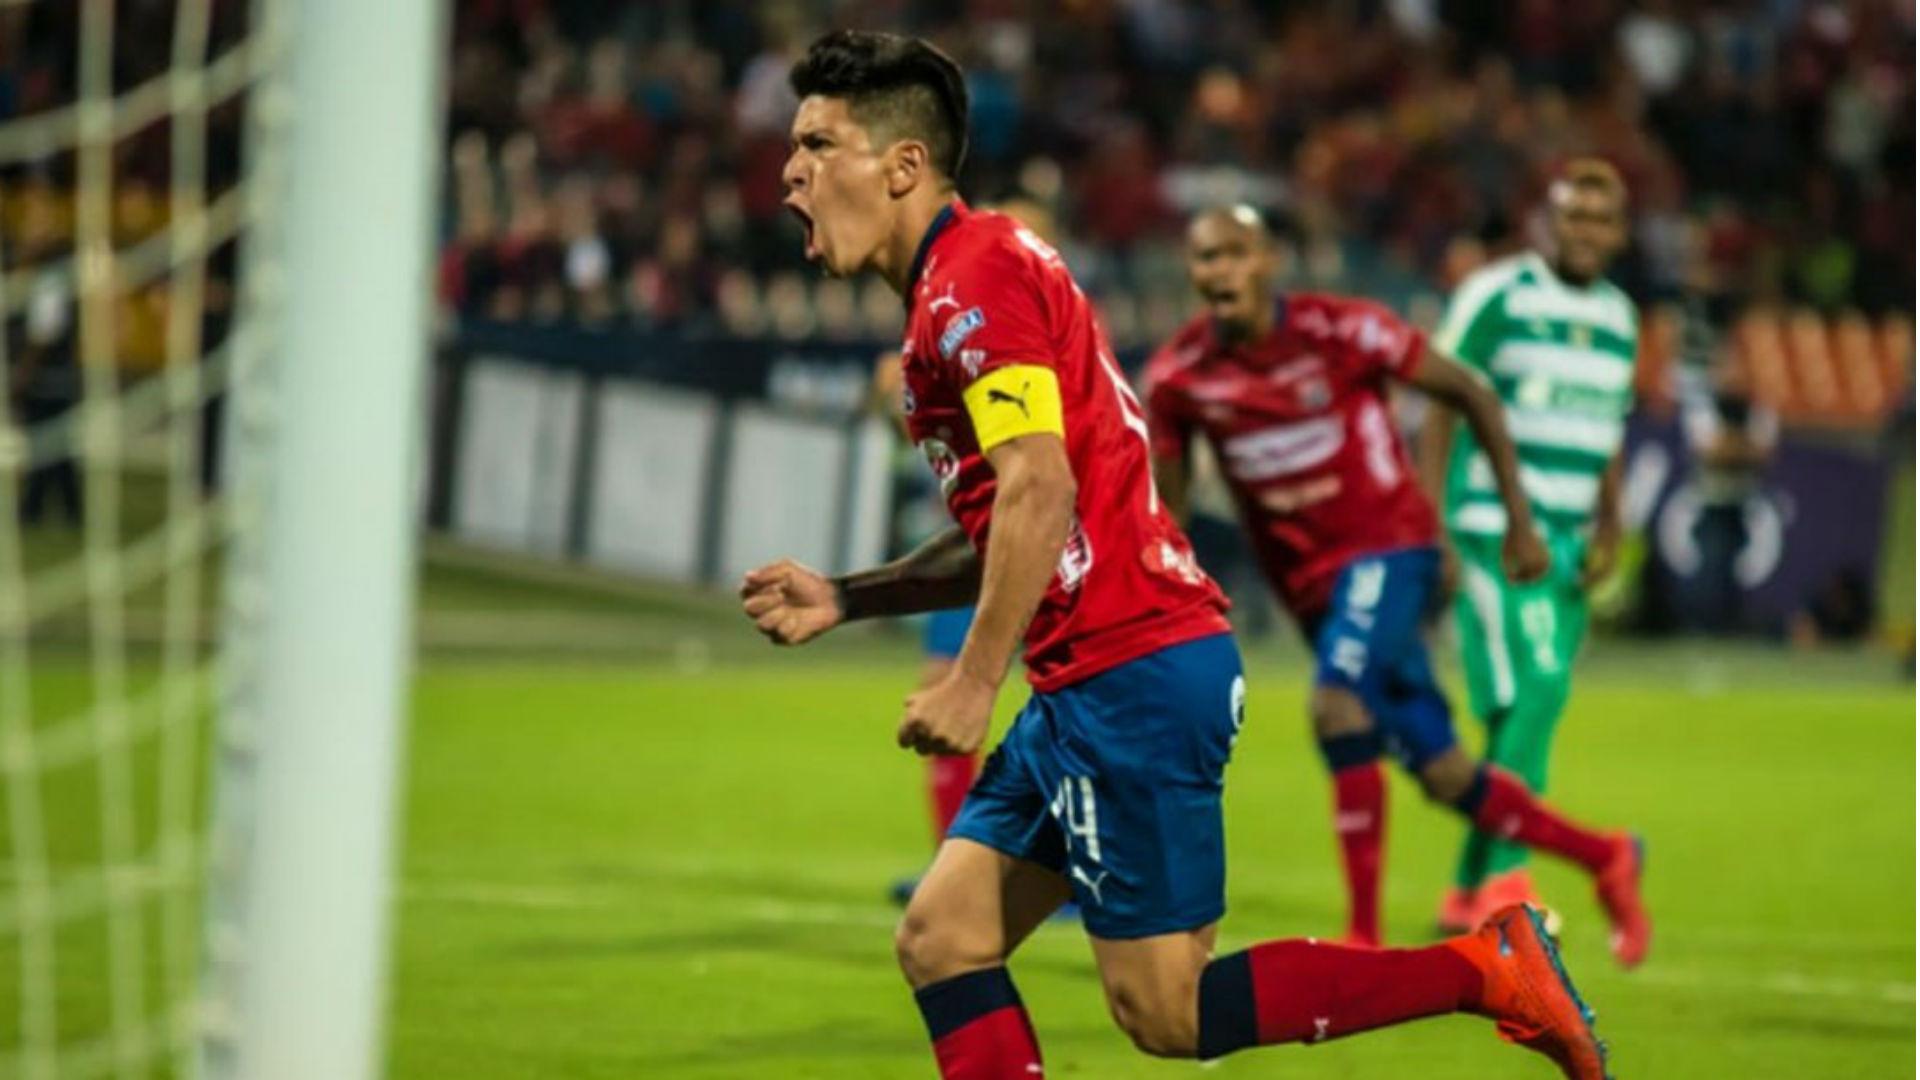 German Cano gol Independiente Medellín 2019